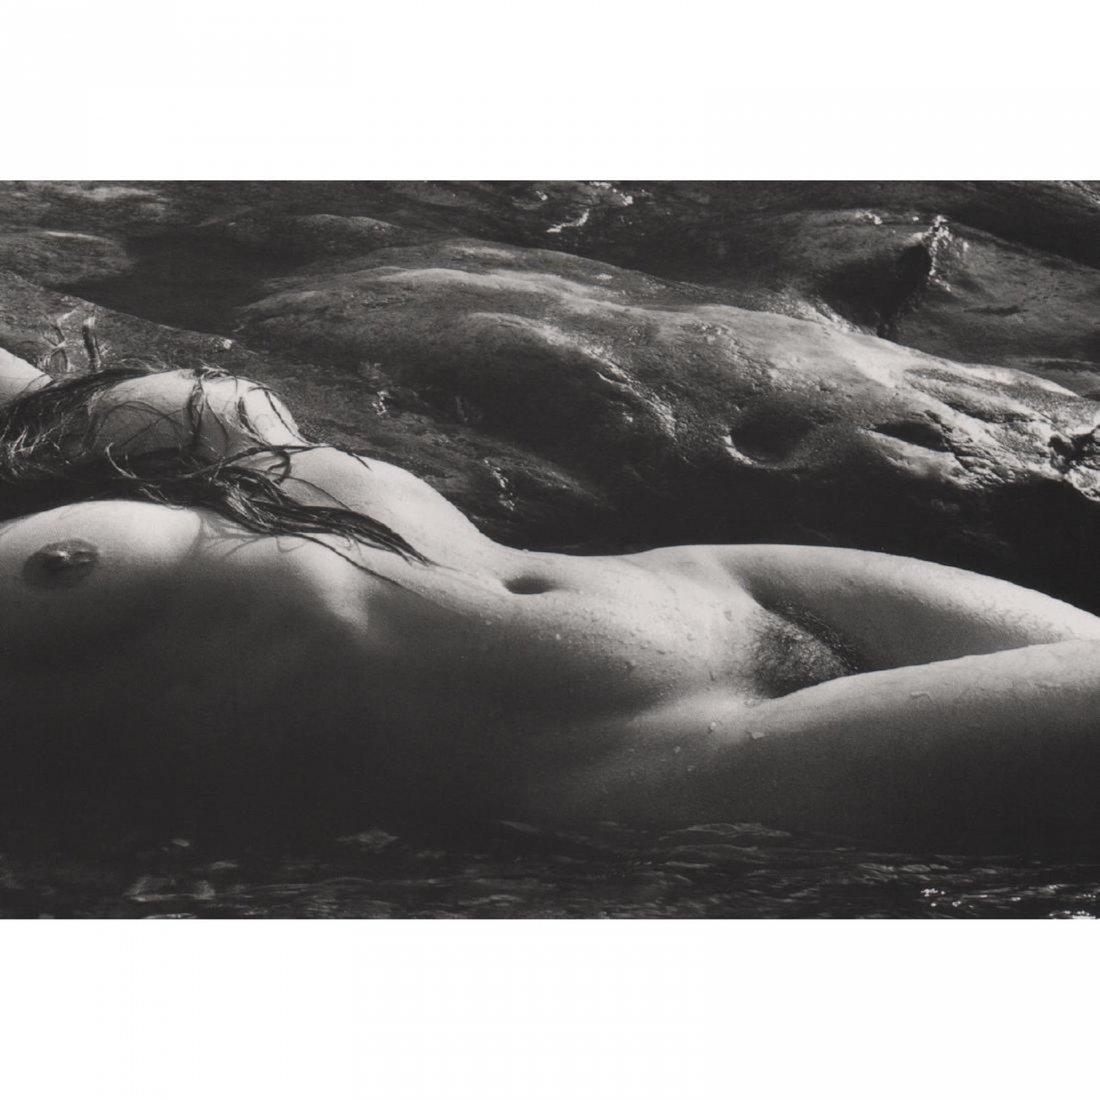 LUCIEN CLERGUE - Nude, Saorge - 2